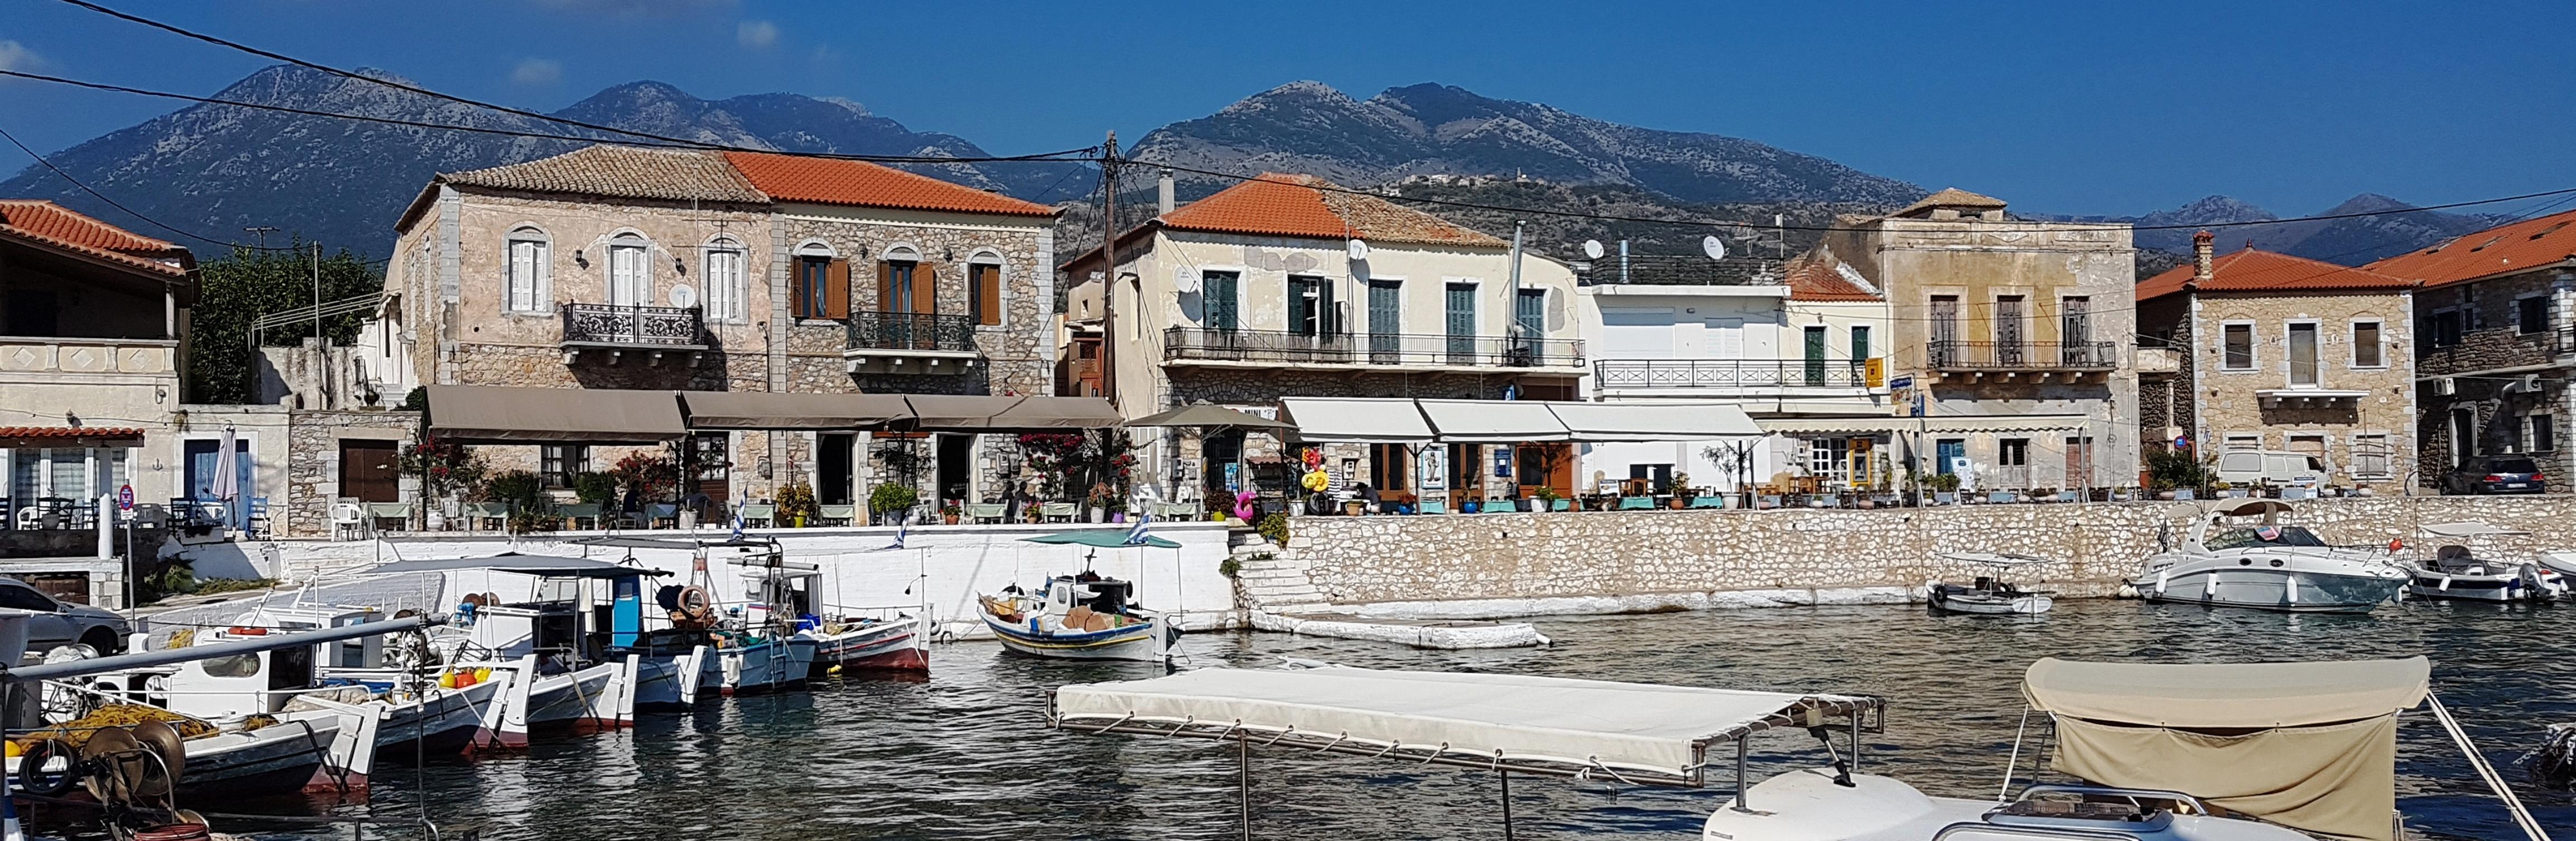 Banner_Peloponnesos-Agios_Nikolaos_02